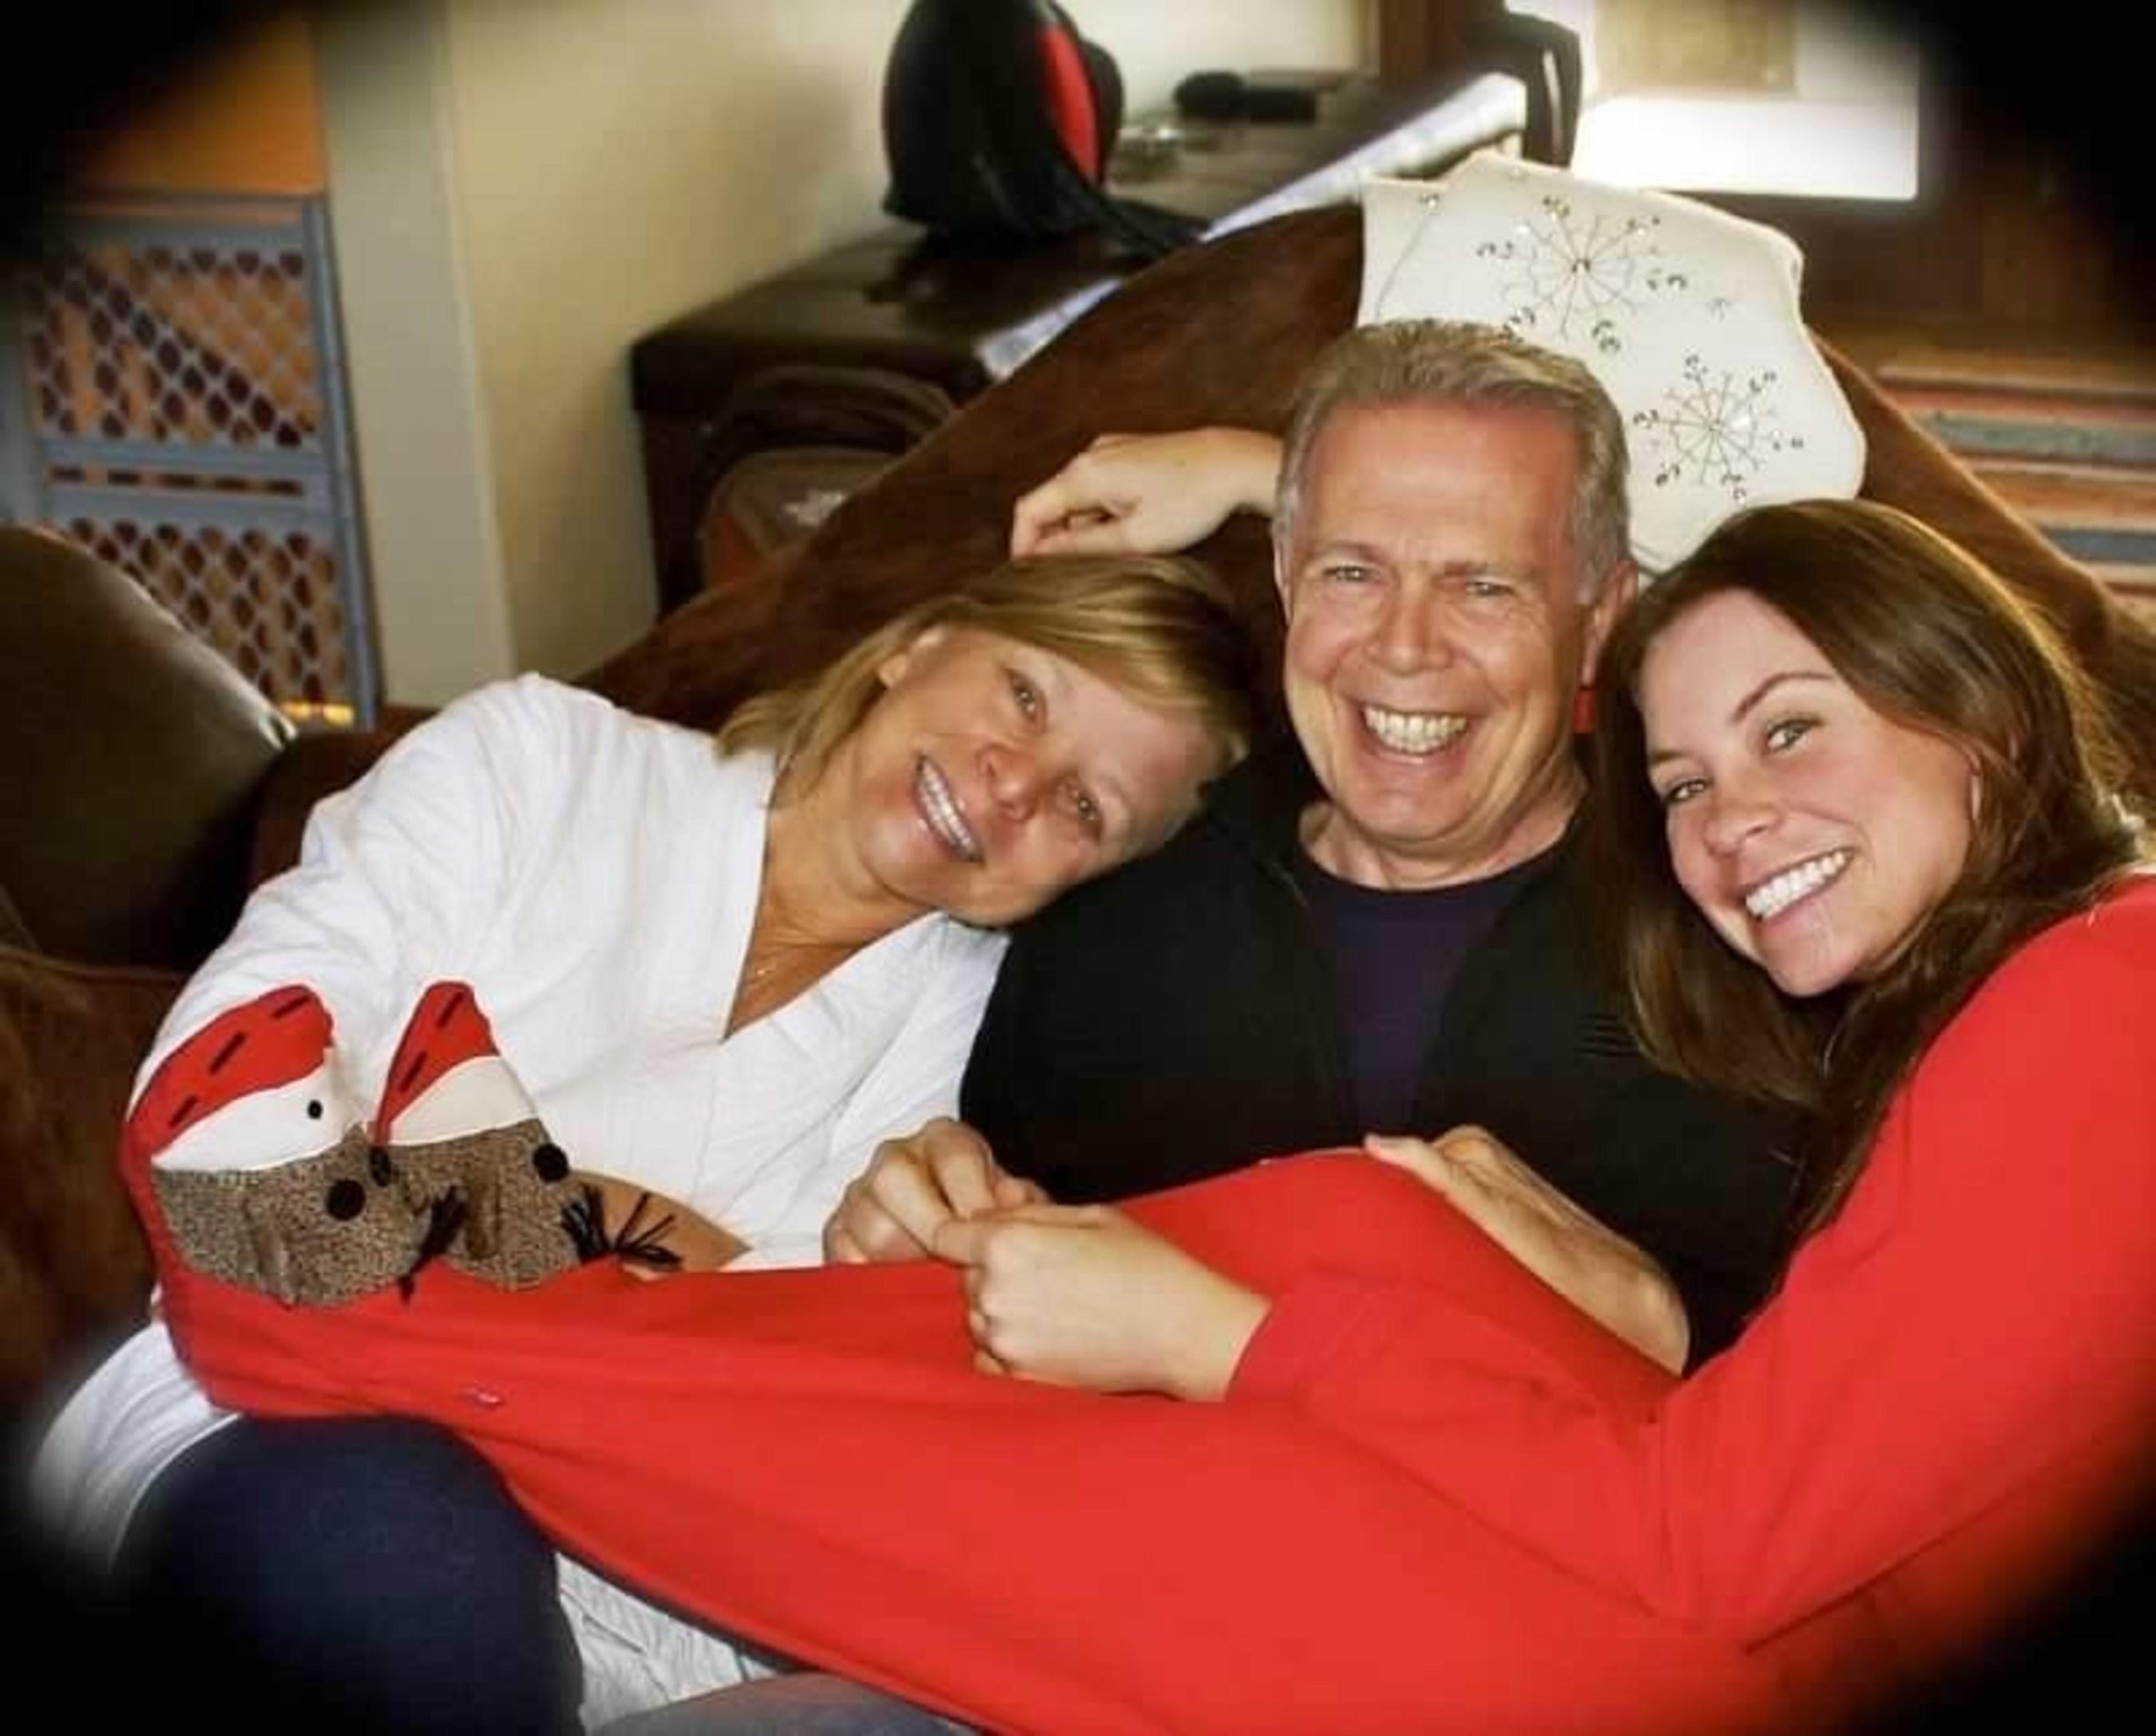 Debbie Ziegler, husband Gary Holmes, Debbie's daughter Brittany Maynard